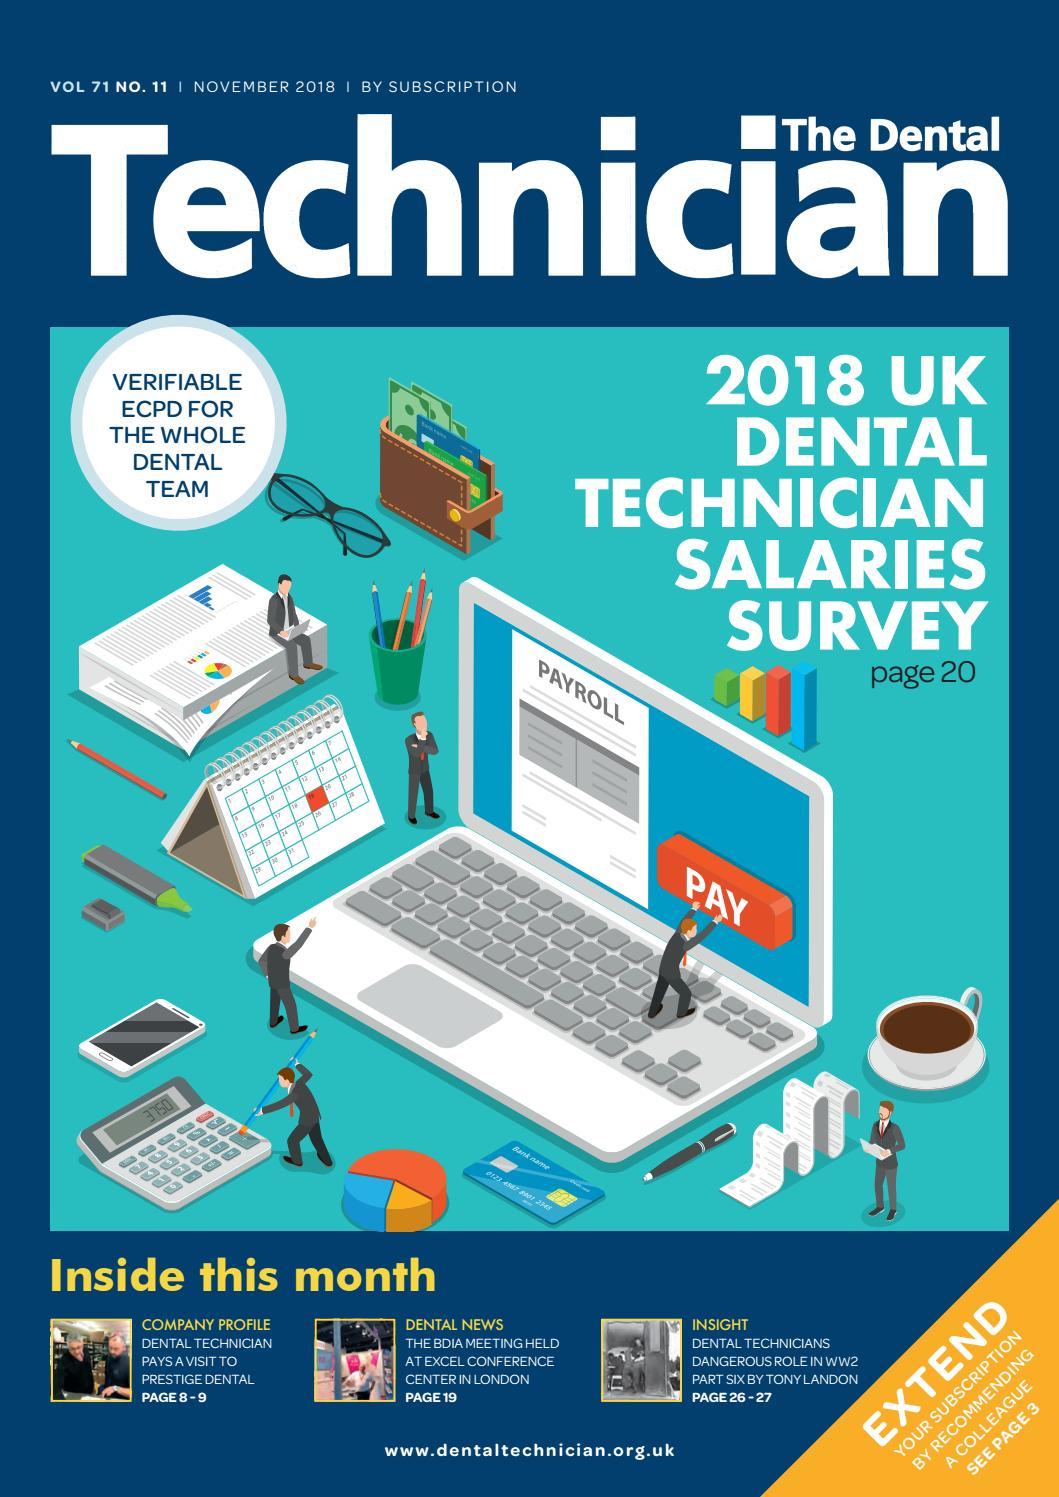 The Dental Technician Magazine November 2018 by The Dental